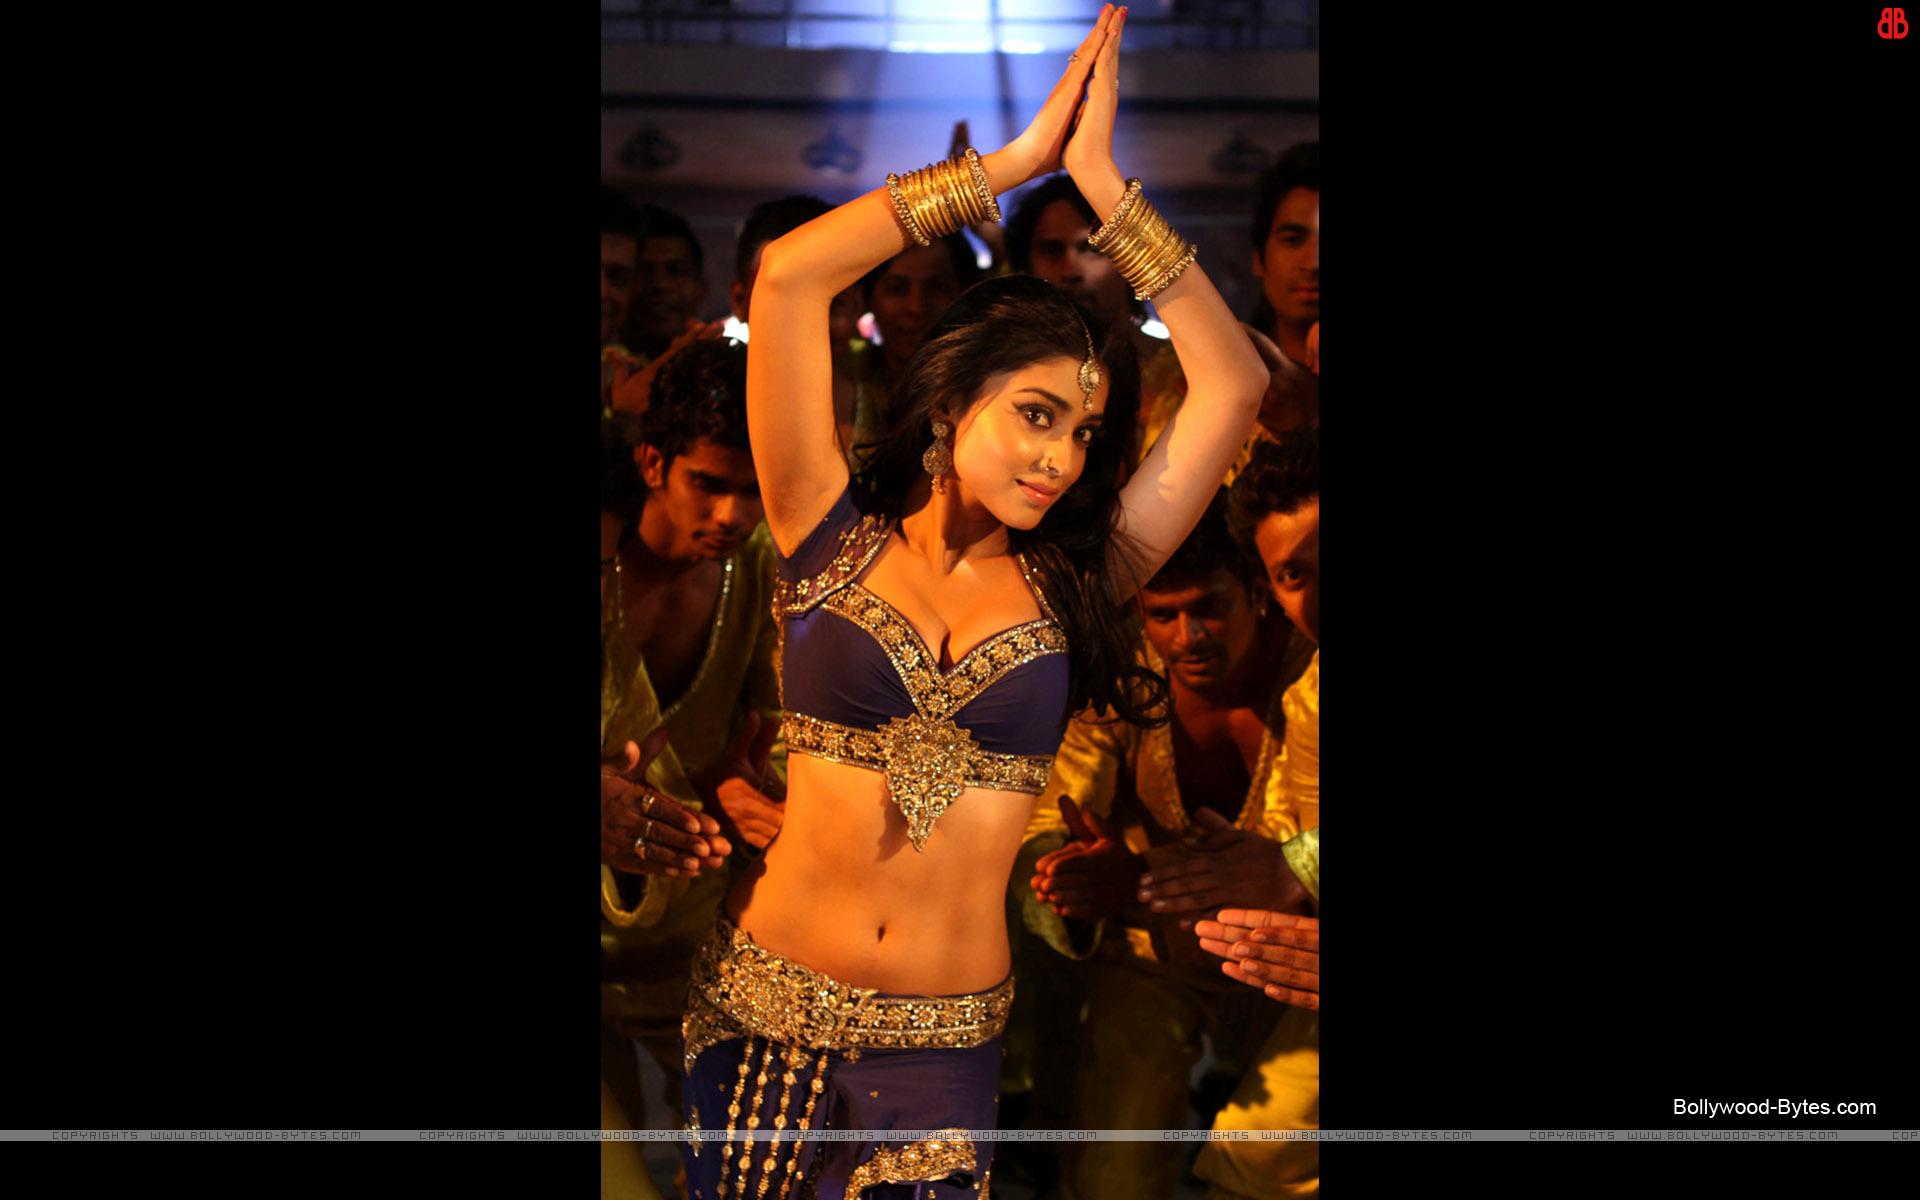 katrina kaif in dhoom wallpapers - Katrina Kaif in Dhoom 3 Hot Photos Movie News Page 1